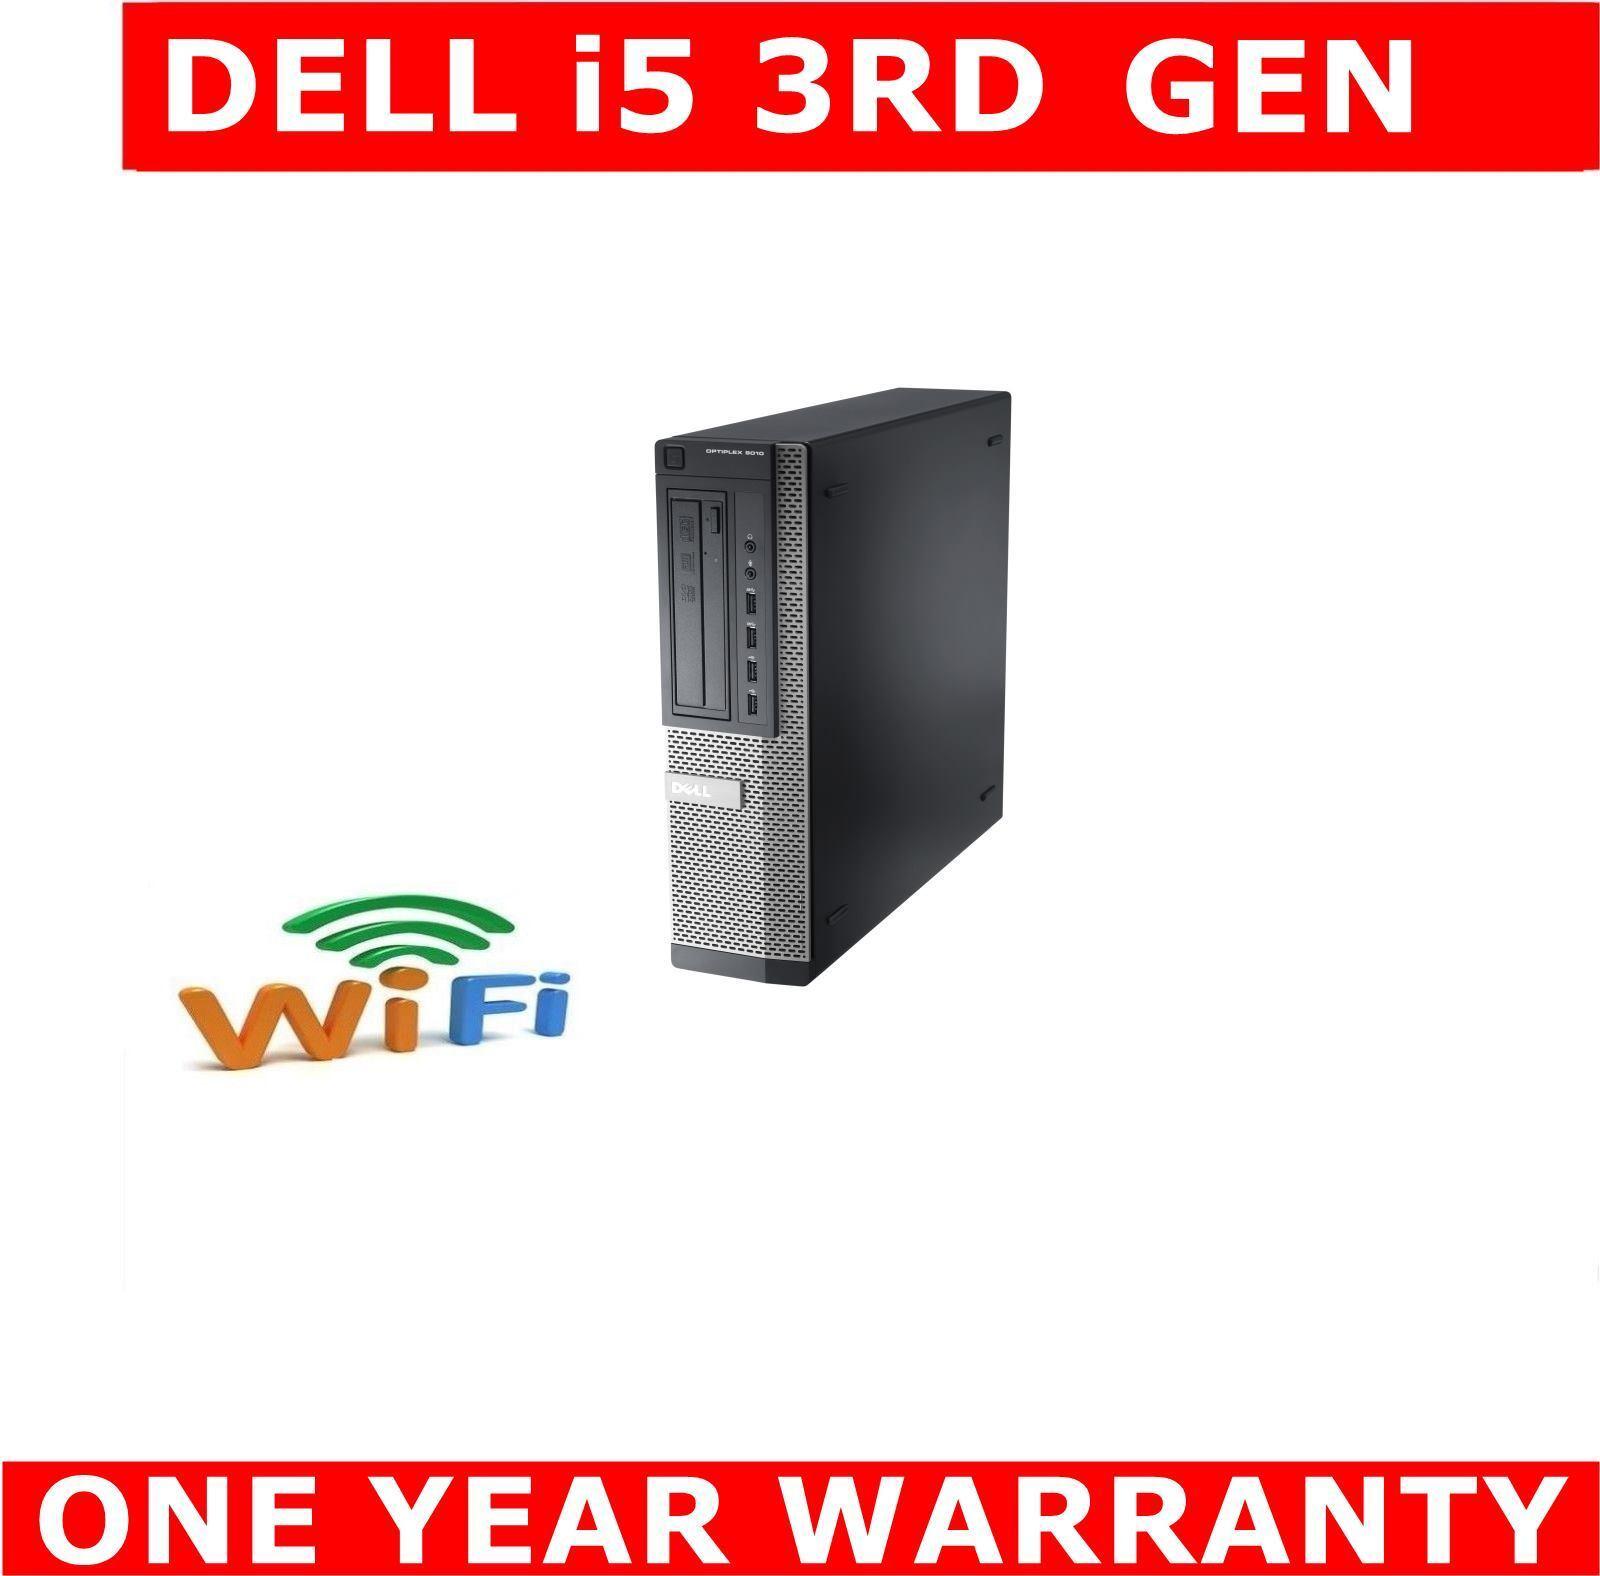 Computer Games - DELL i5 3rd GEN COMPUTER PC 8GB 480GB SSD DUAL SCREEN WINDOWS 10 OR 7 WIFI